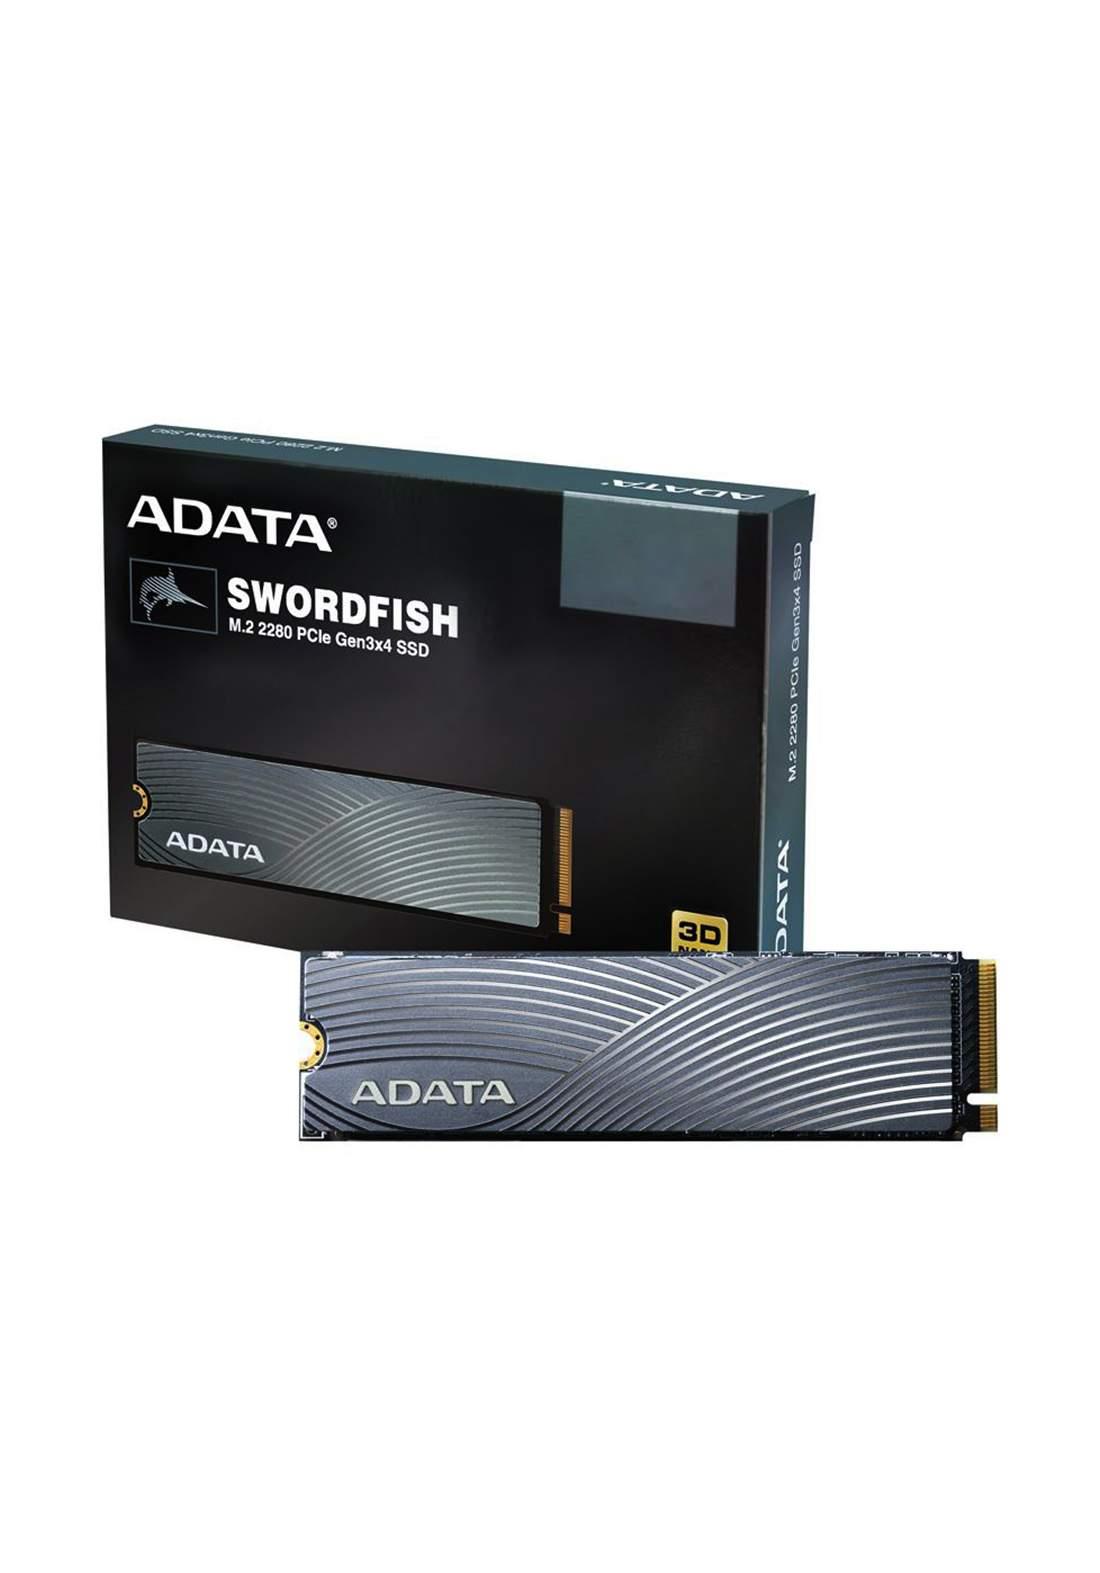 Adata Swordfish 500GB 3D NAND PCIe Gen3x4 NVMe M.2 Solid State Drive